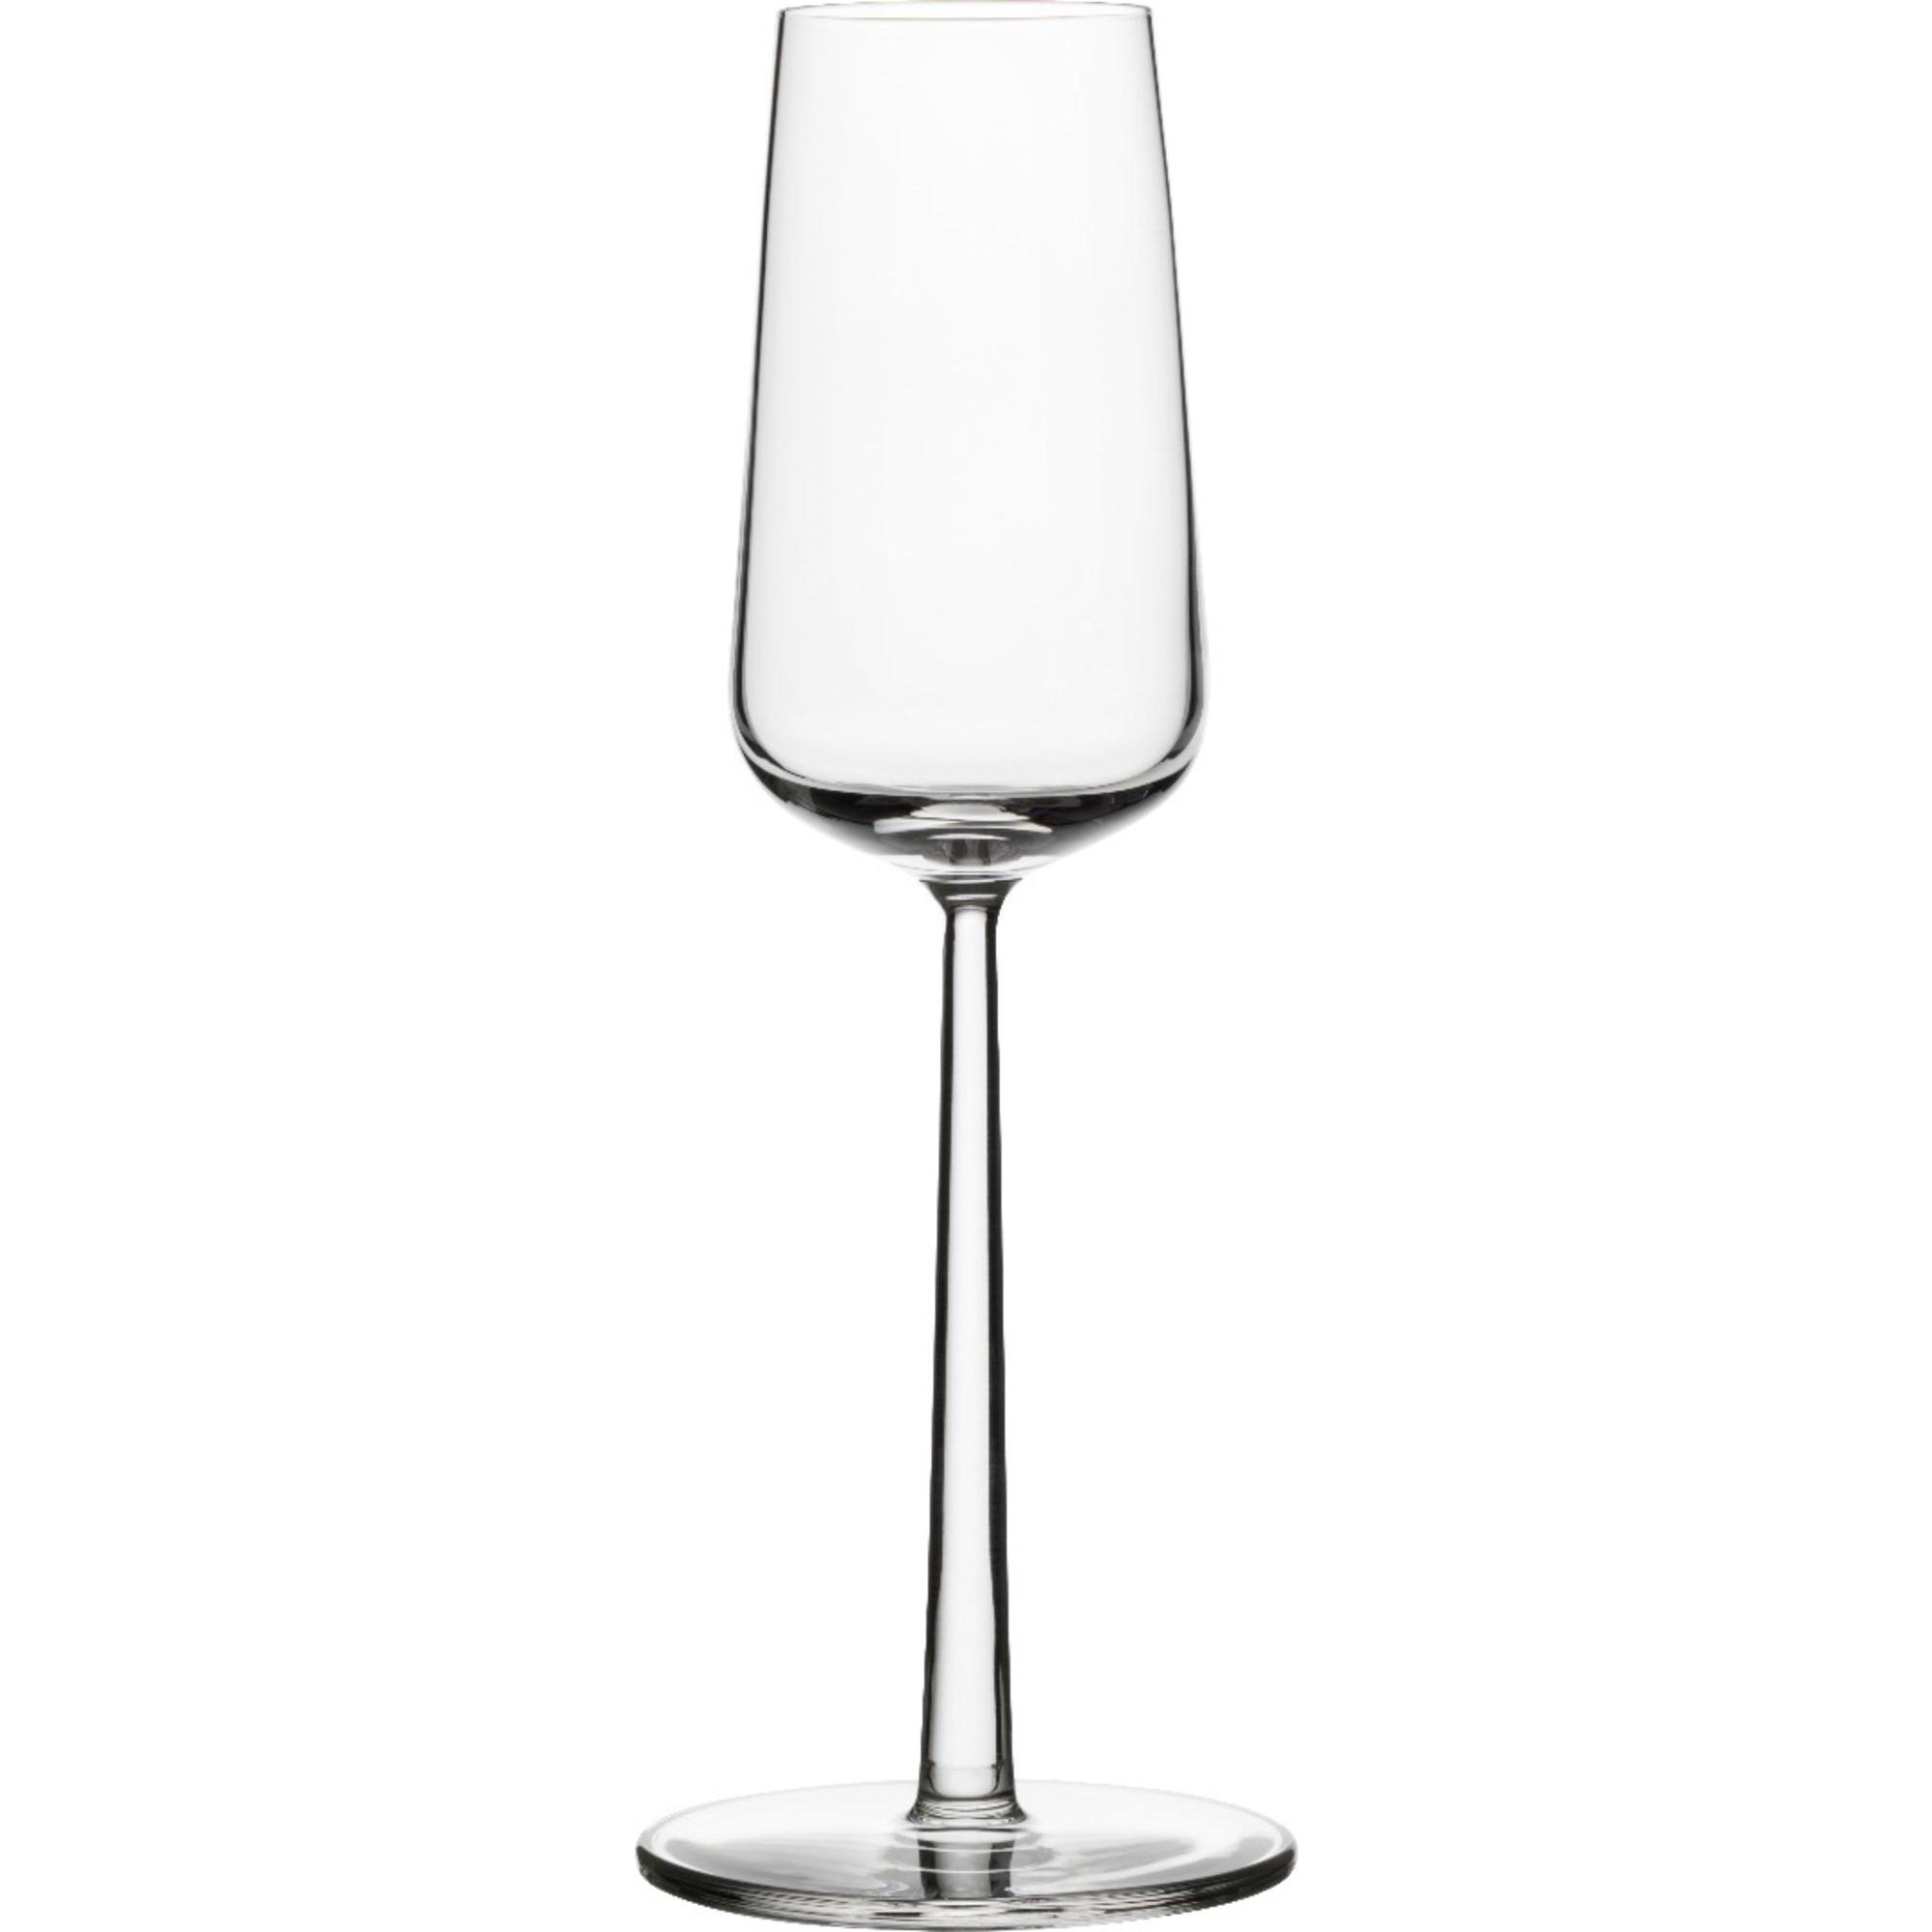 Iittala Essence champagneglas 2 stk.